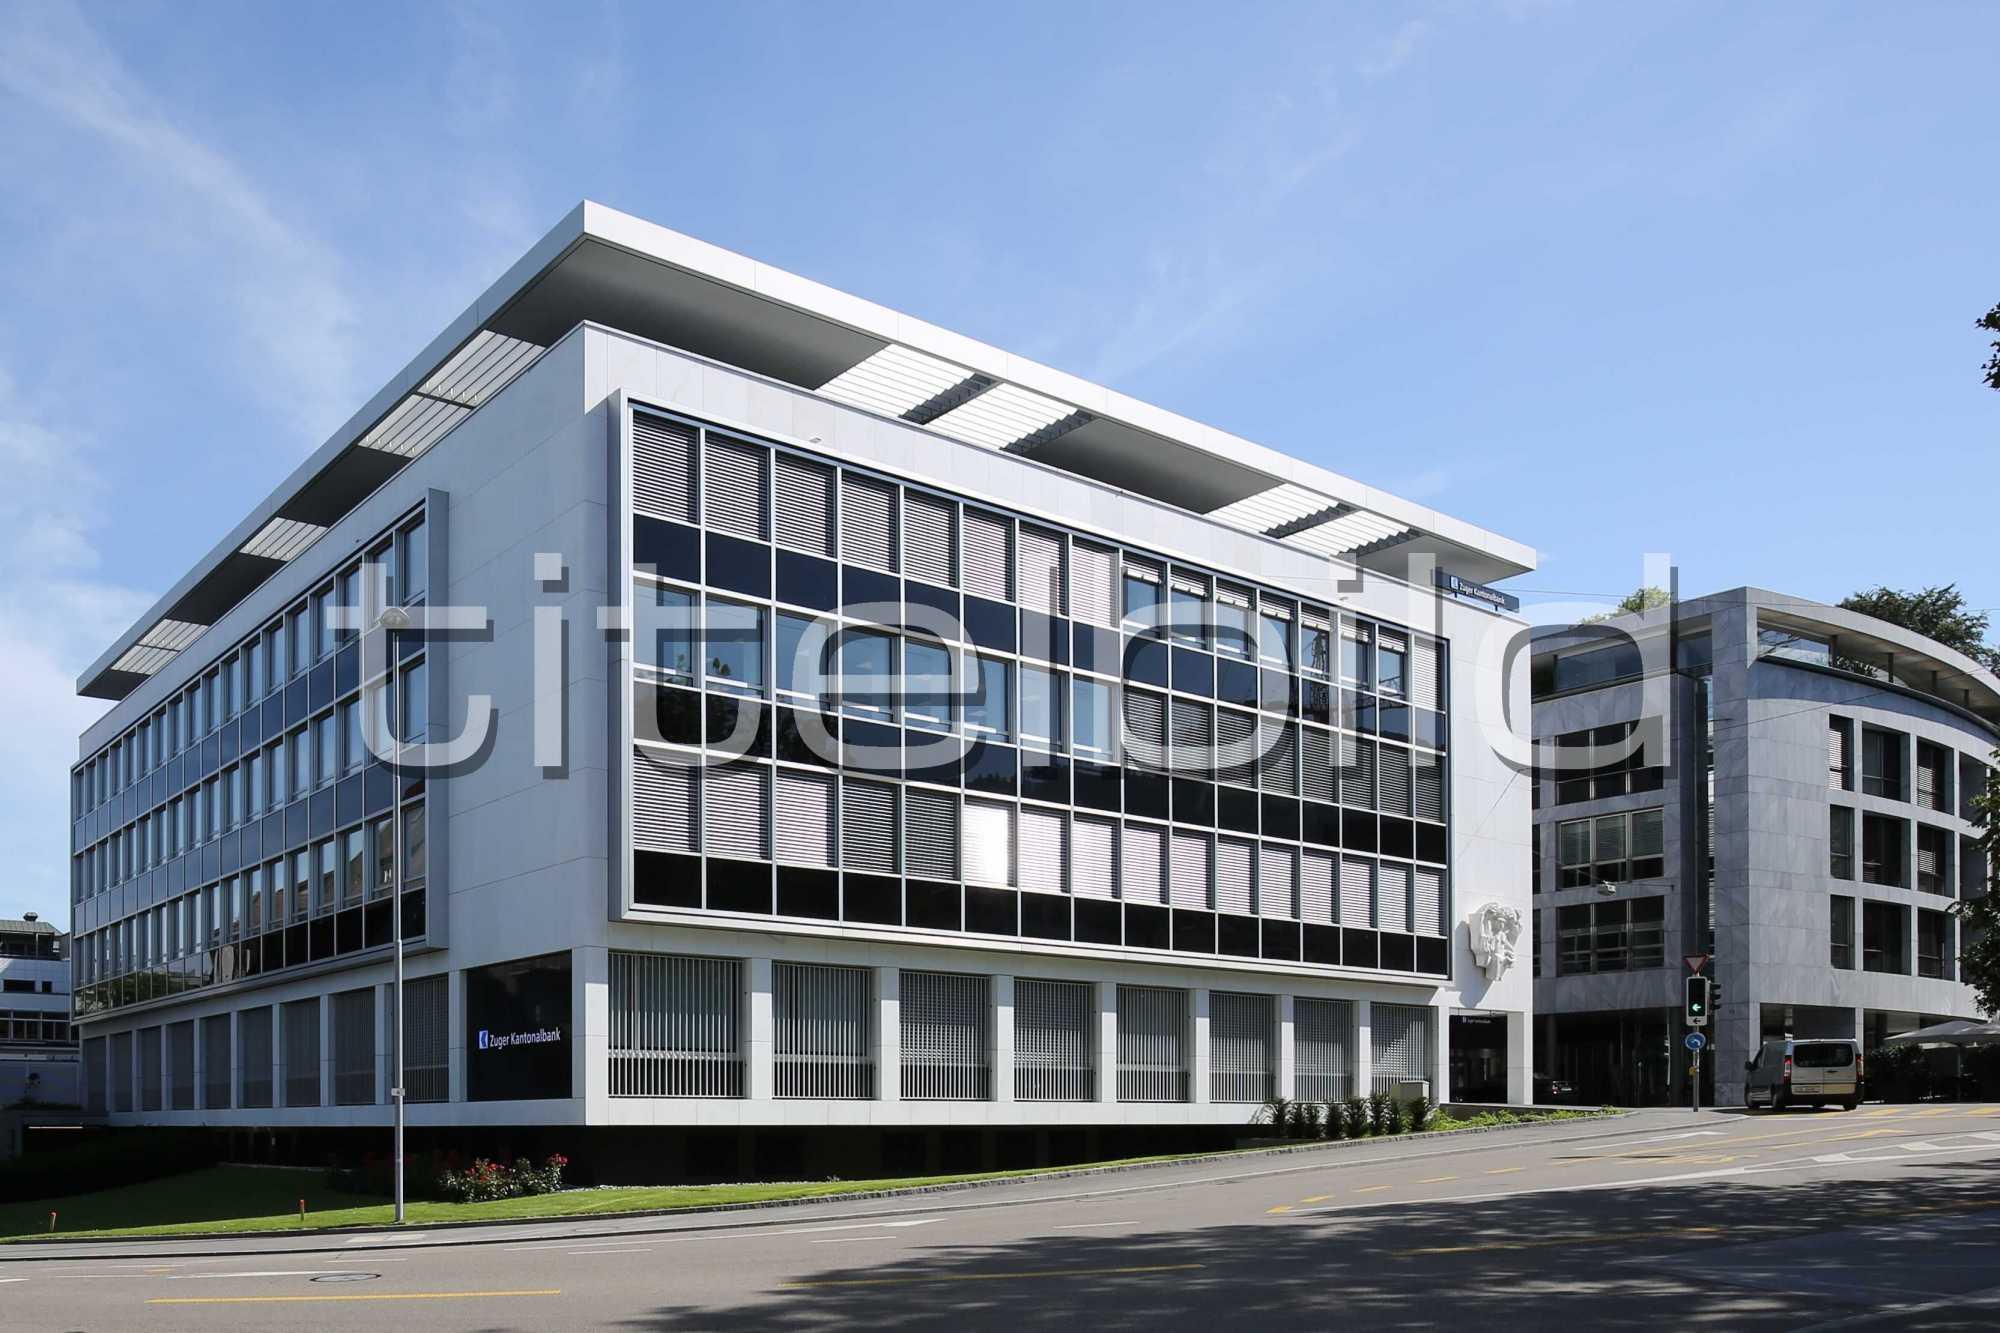 Projektbild-Nr. 0: Zuger Kantonalbank